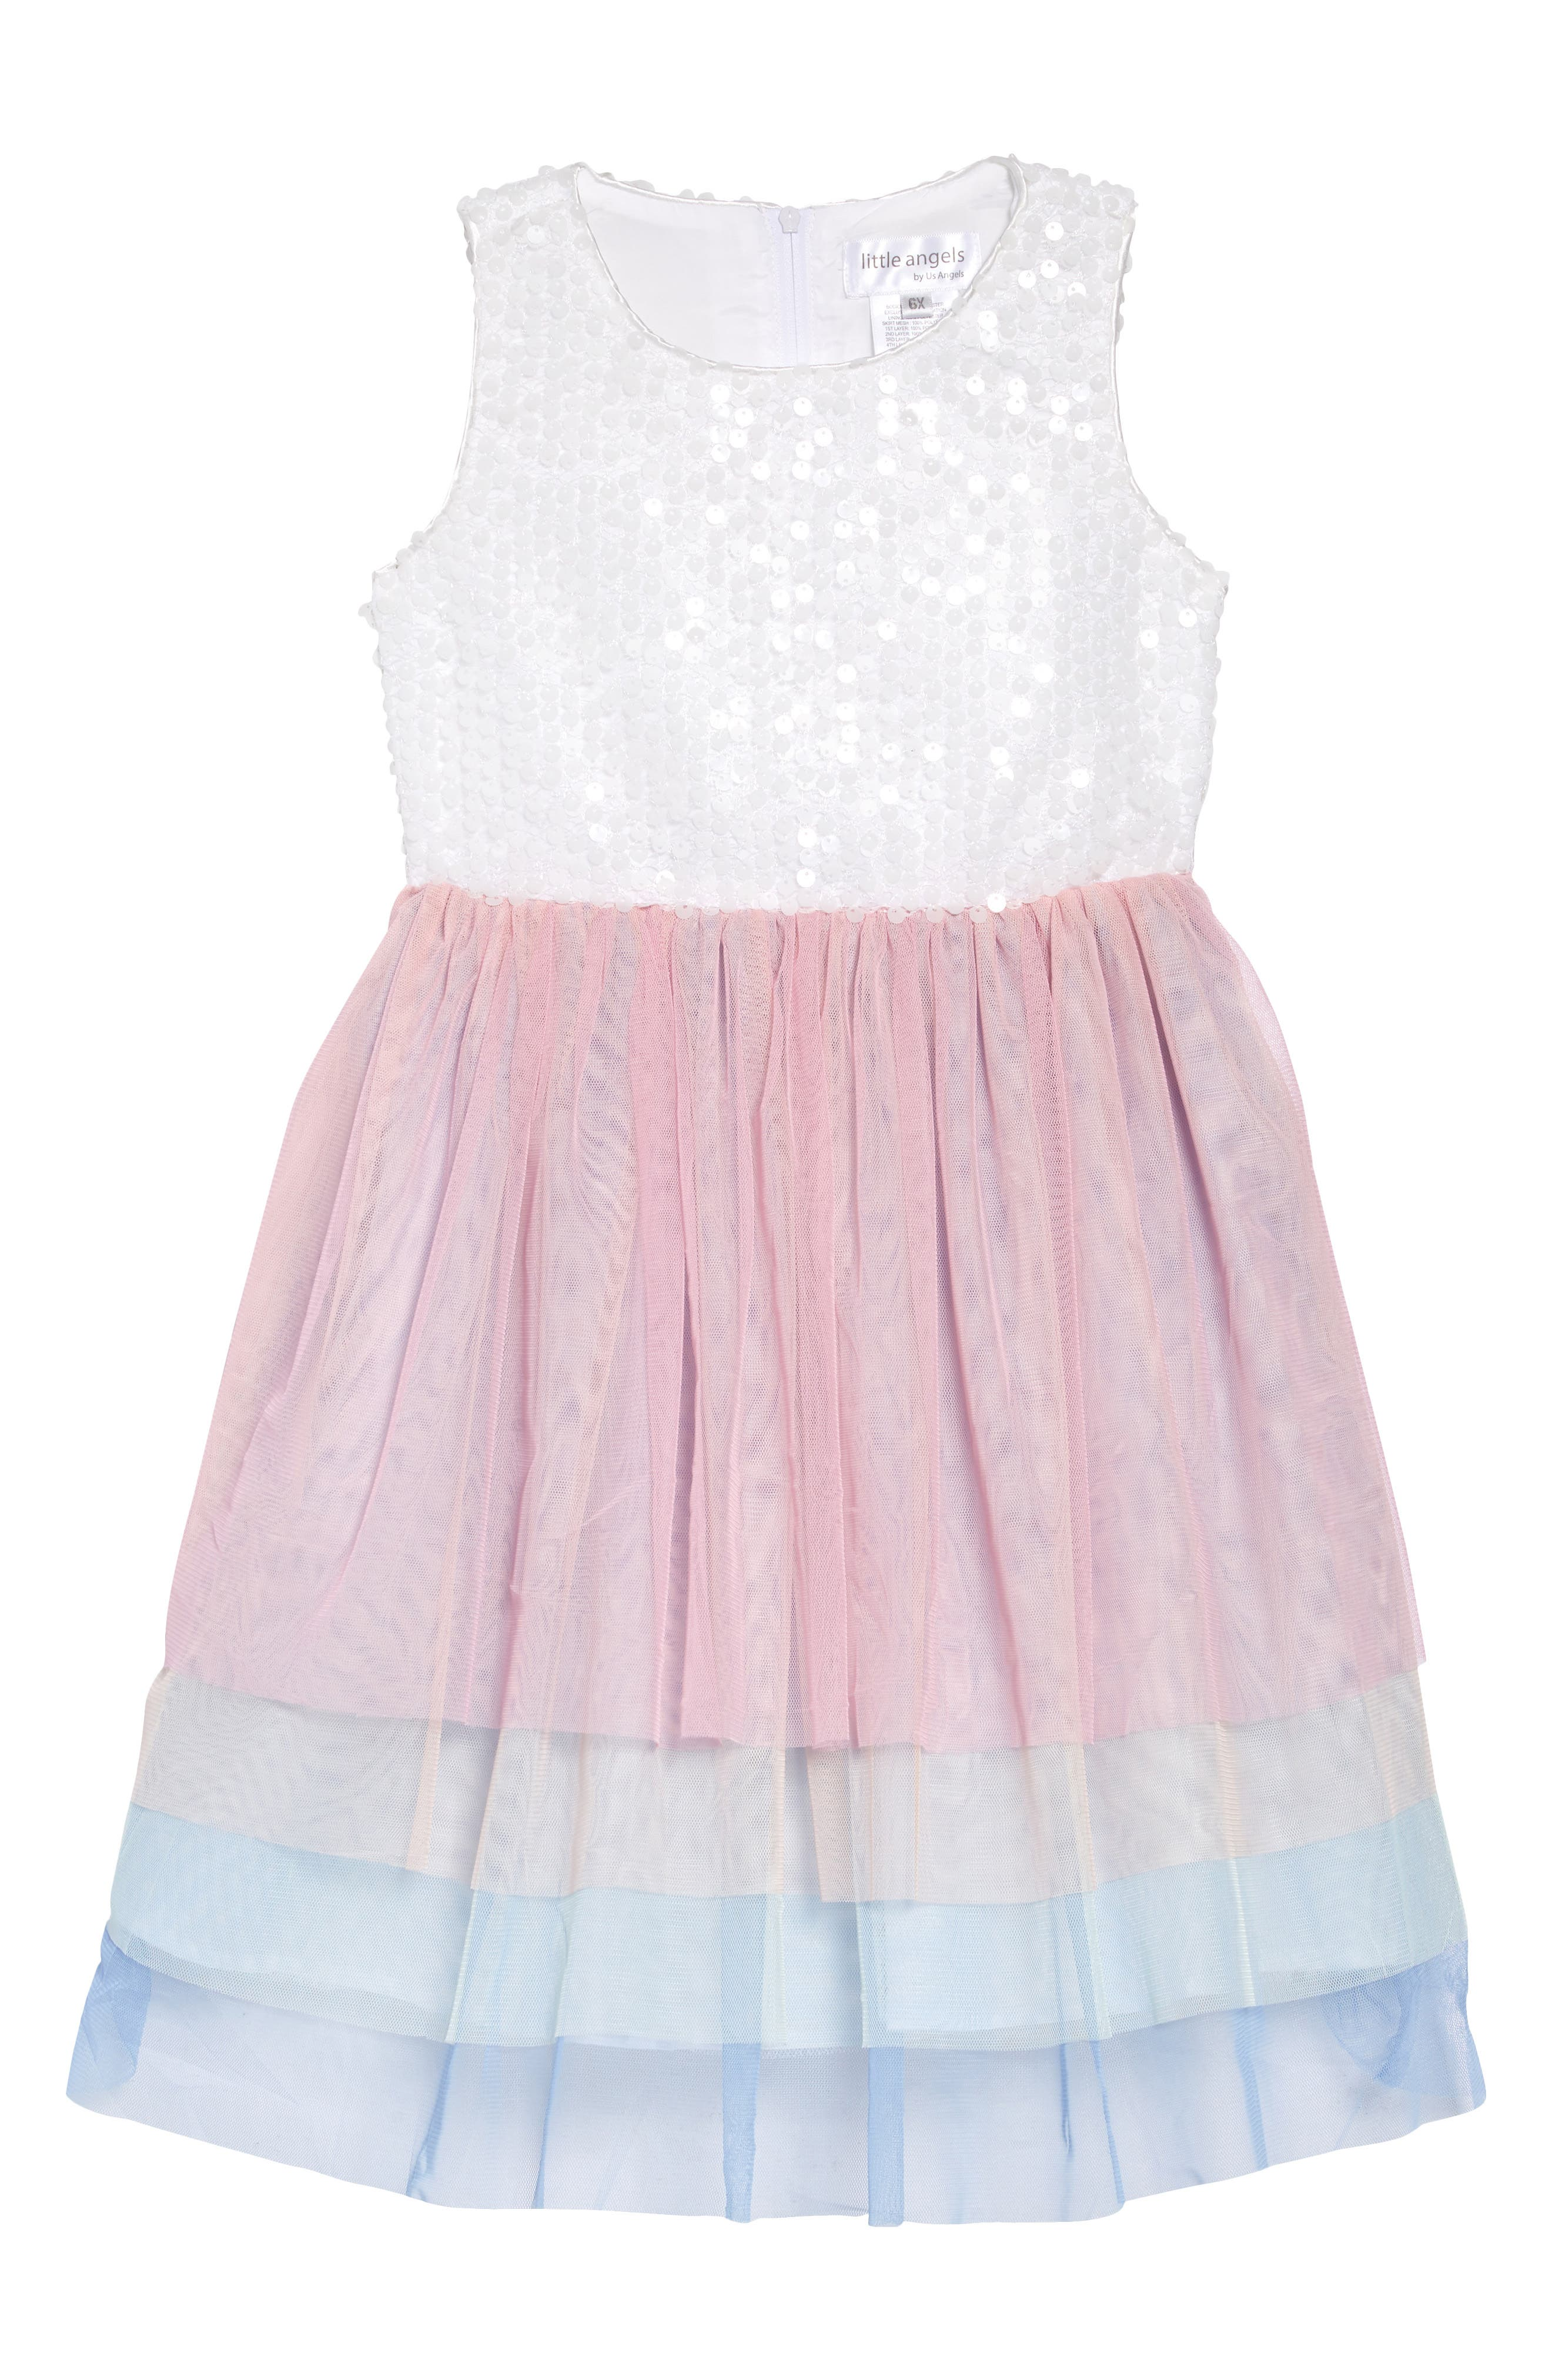 LITTLE ANGELS Sequin & Tulle Ballerina Dress, Main, color, PINK